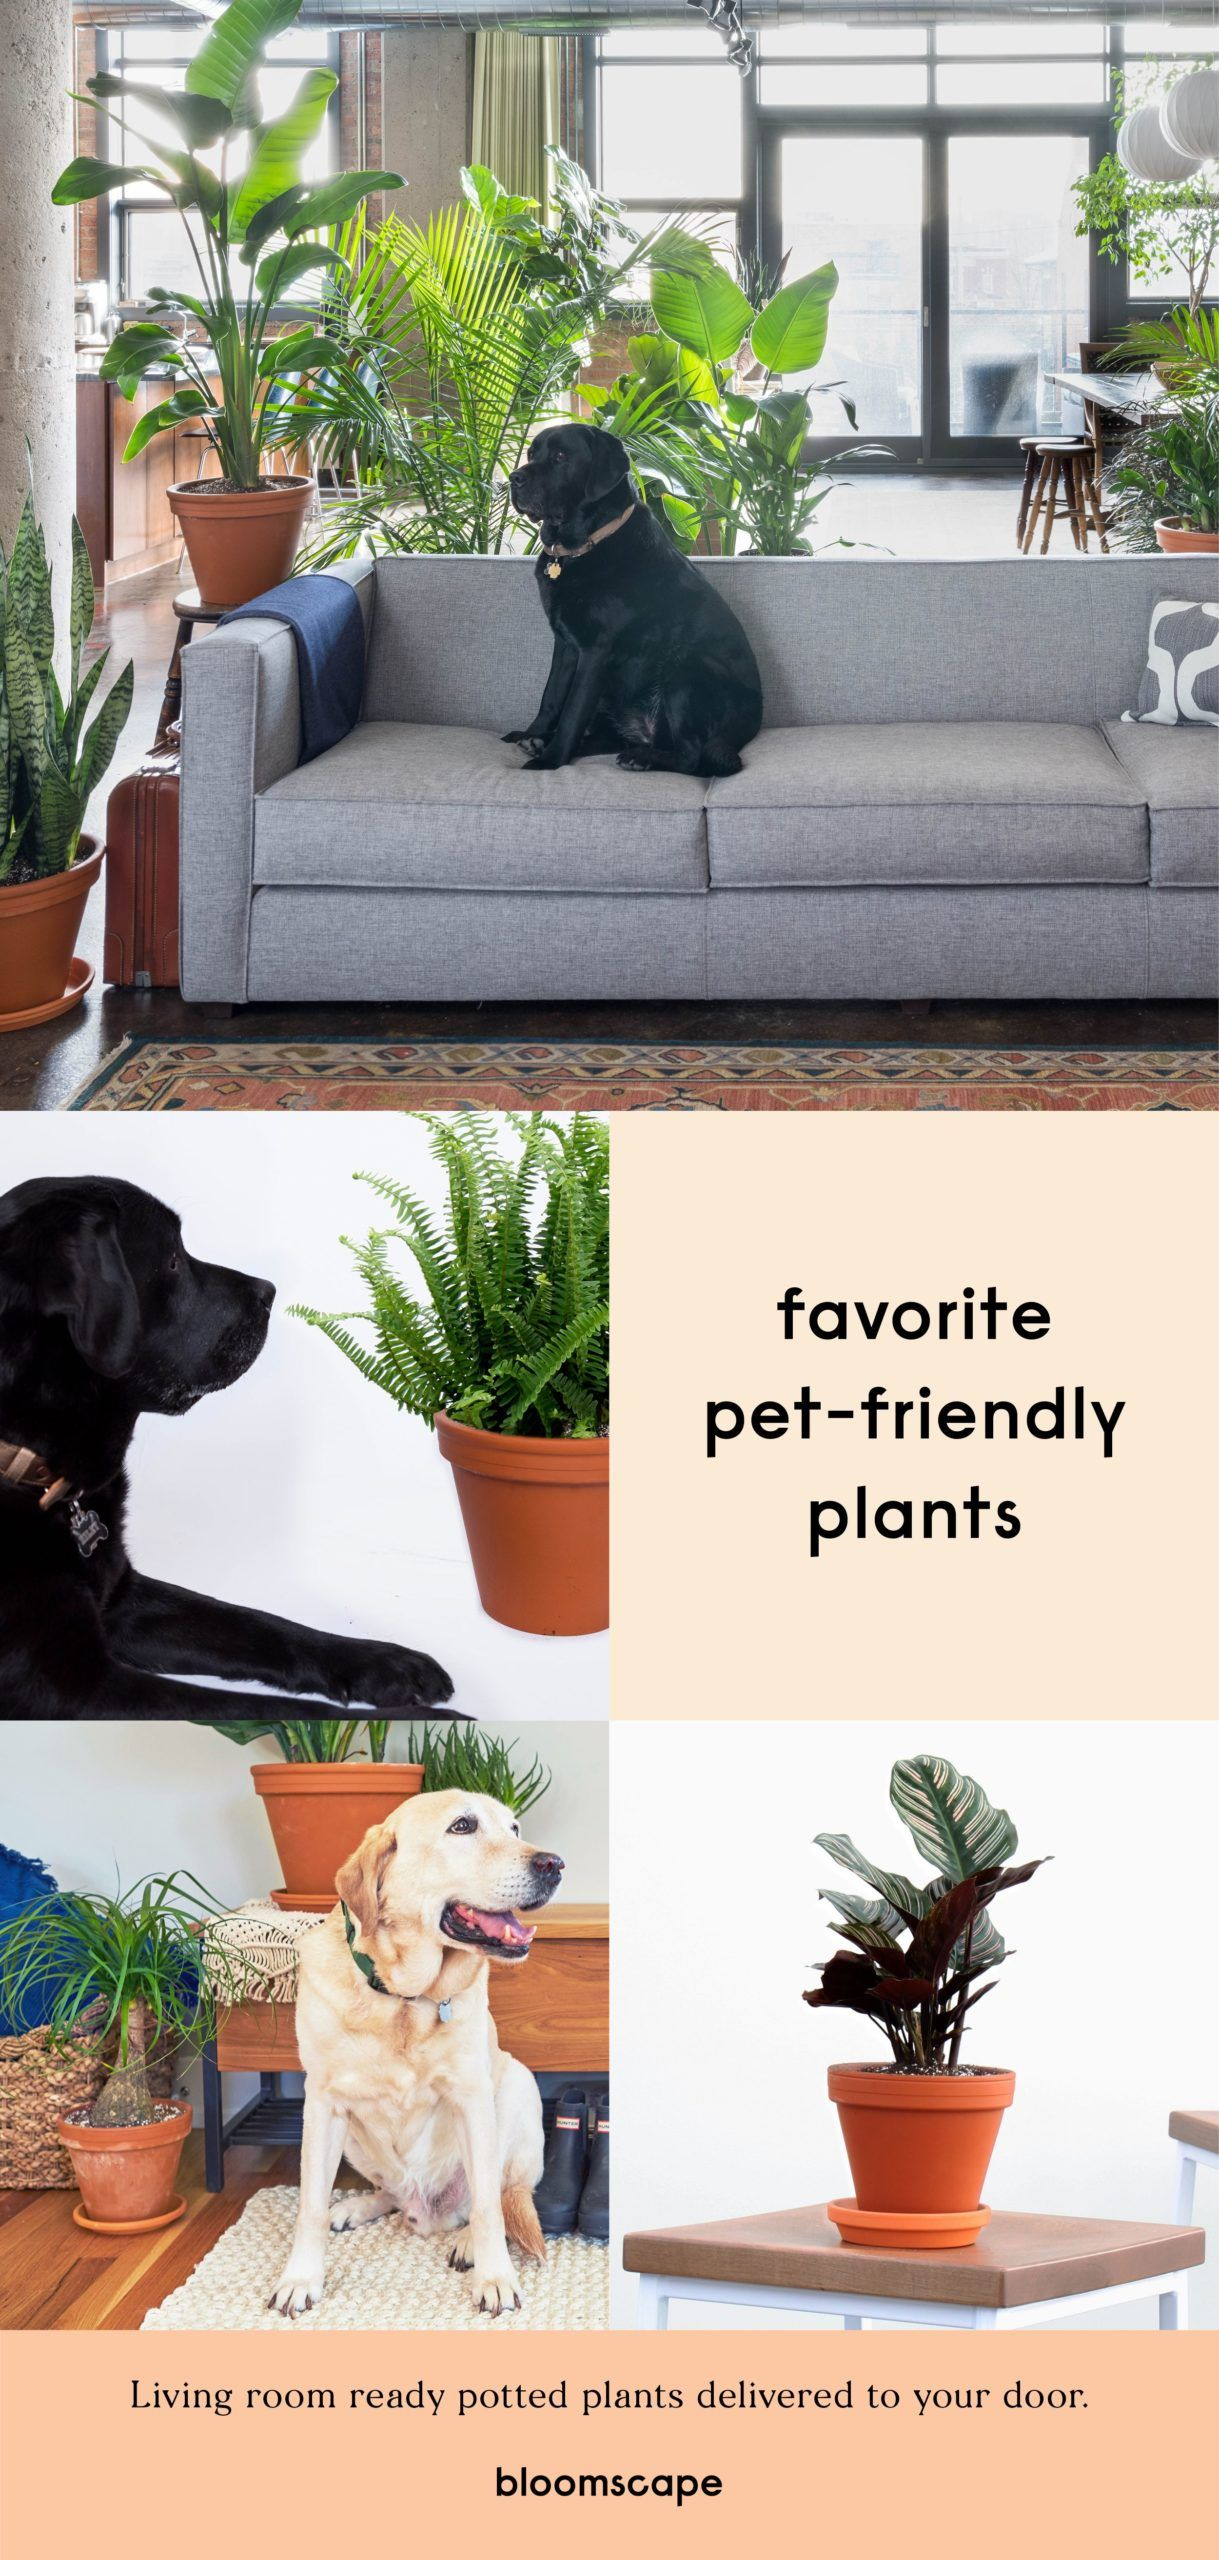 Shop Safe Indoor Plants For Cats And Dogs In 2020 Zimmerpflanzen Ideen Pflanzideen Wohnzimmer Pflanzen